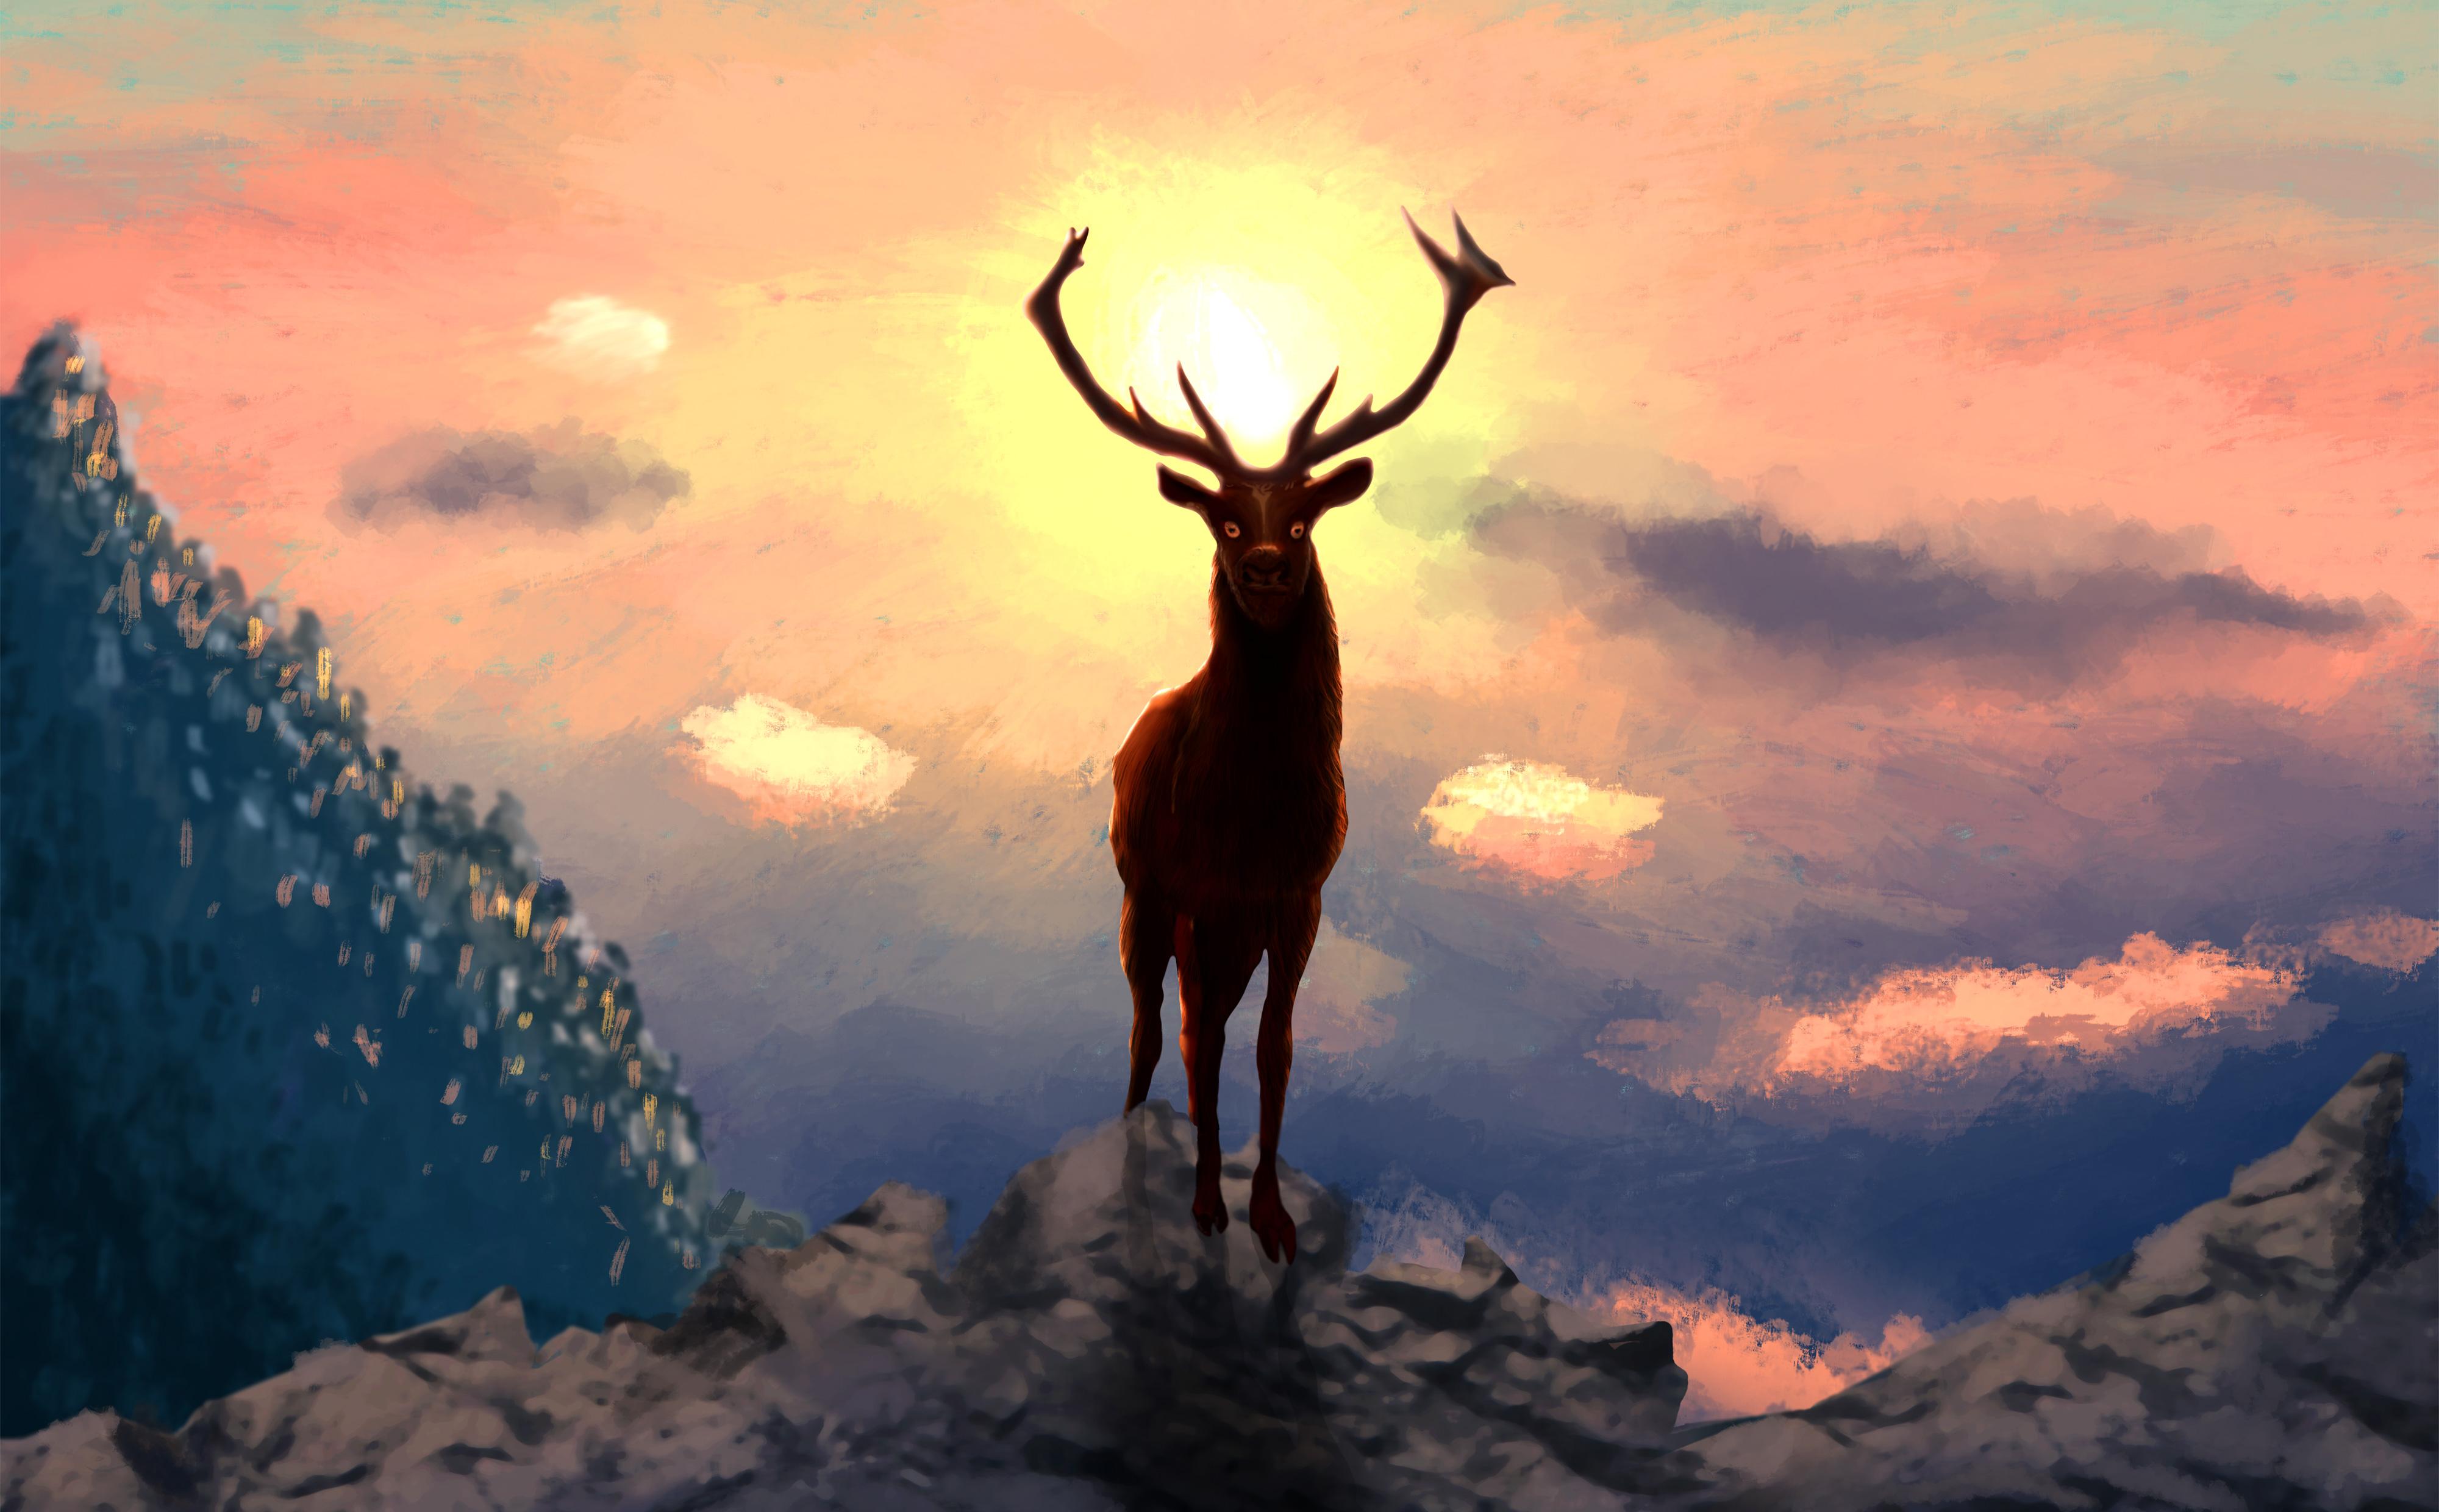 Misty Deer 4k Hd Desktop Wallpaper For 4k Ultra Hd Tv: Deer Artwork 4k, HD Artist, 4k Wallpapers, Images